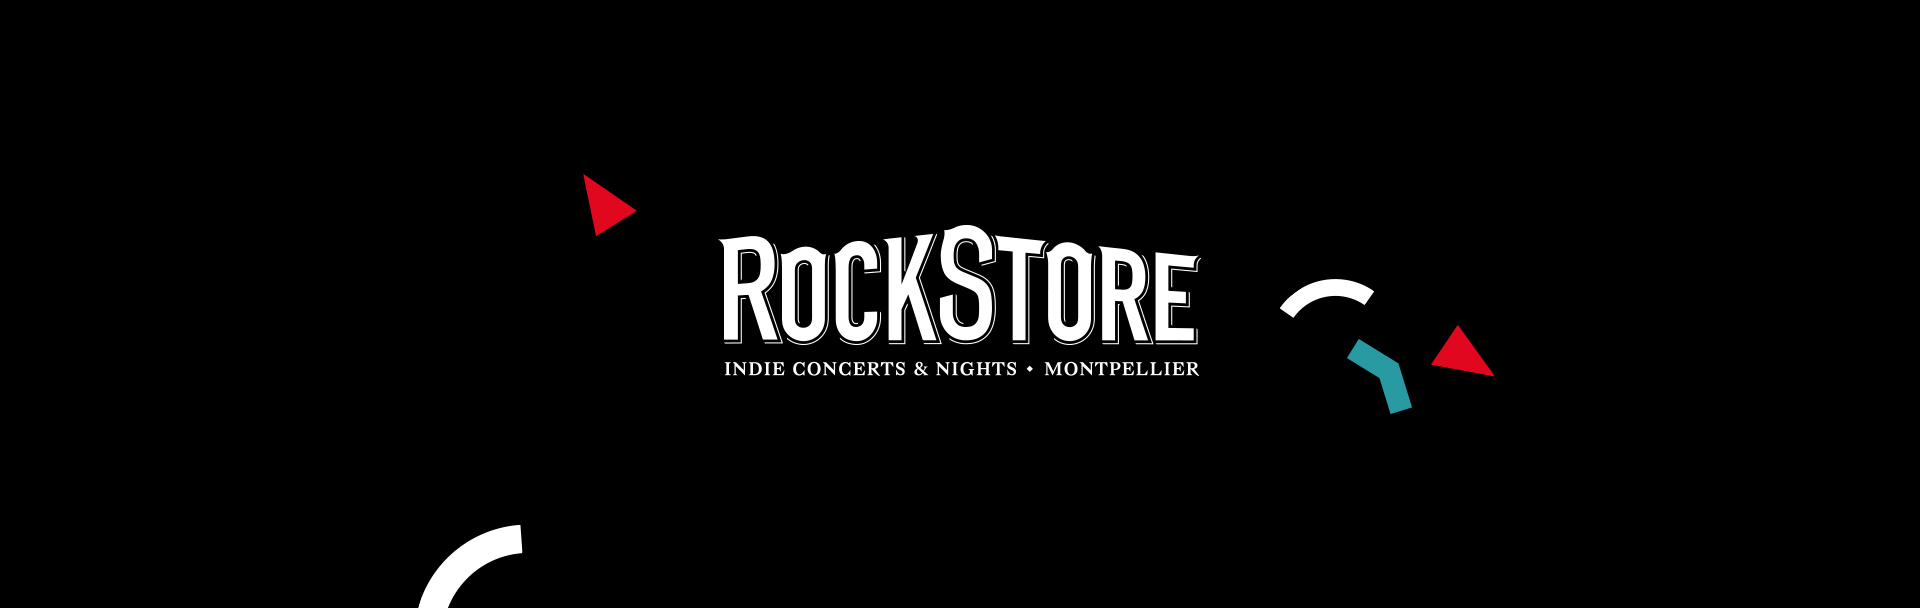 rockstorepresentation-1